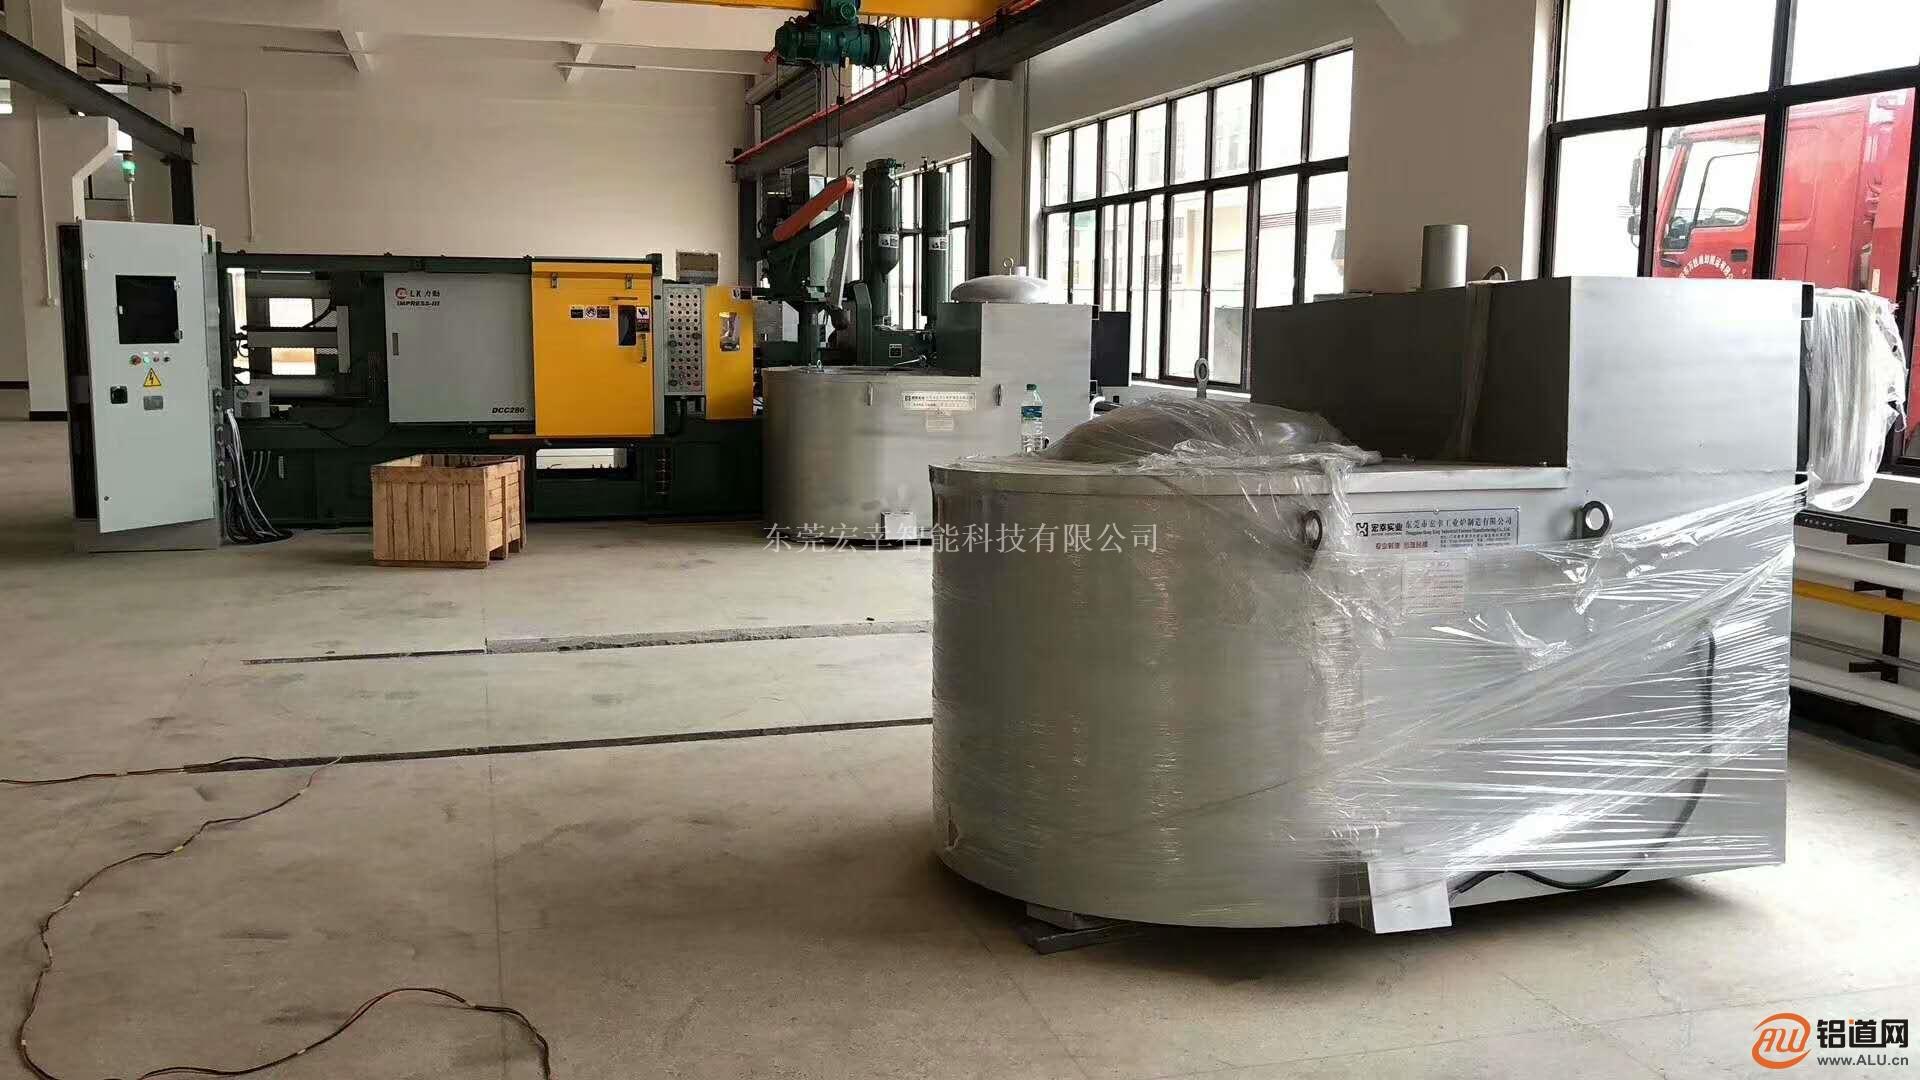 800KG蓄热式熔铝炉 天燃气熔化炉